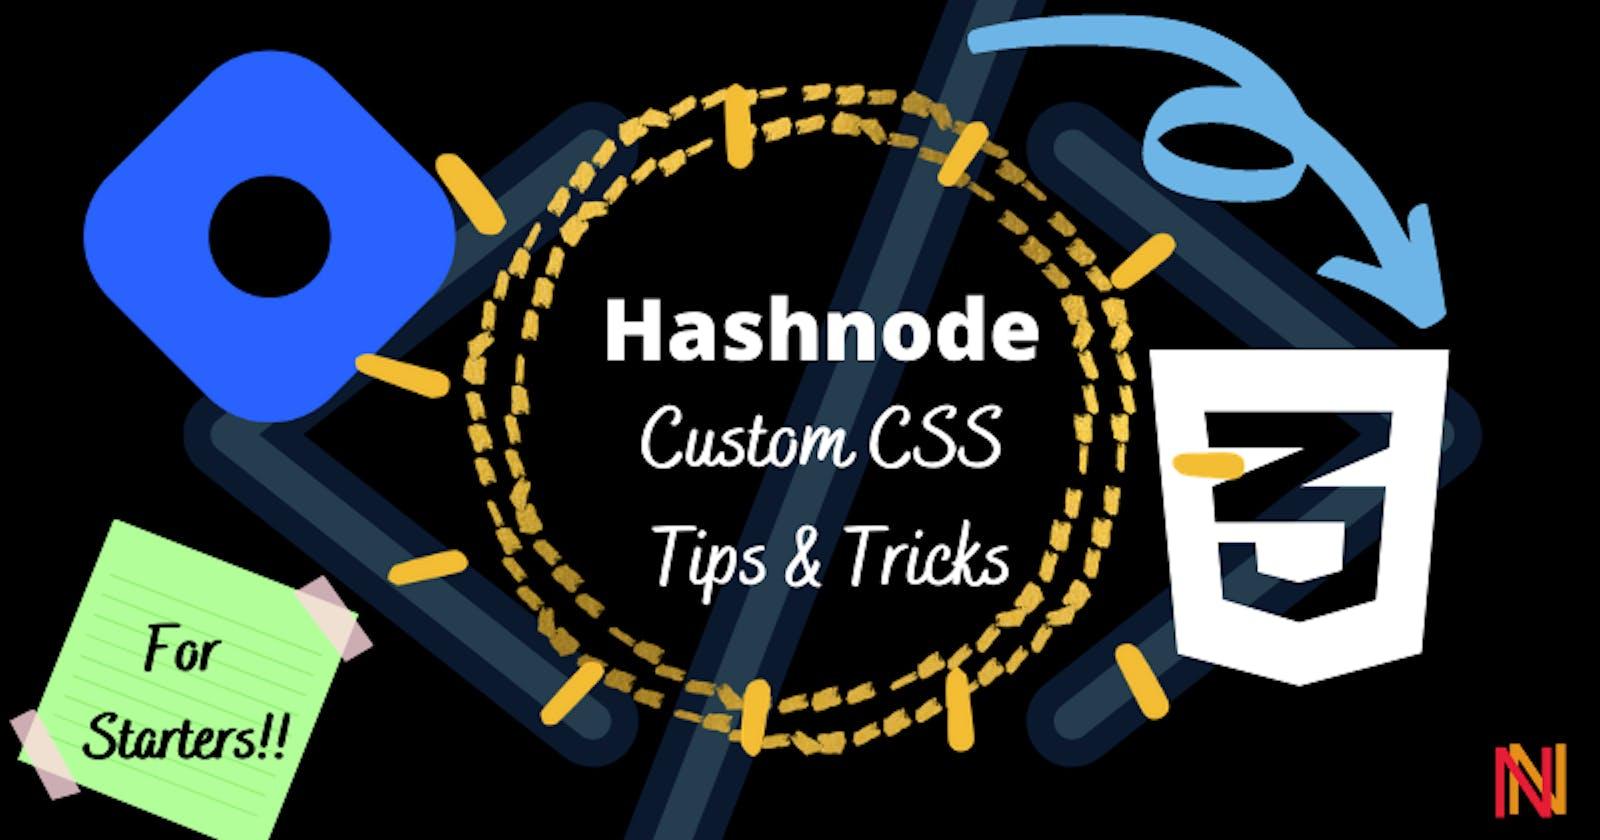 How to customize Hashnode blog with custom CSS